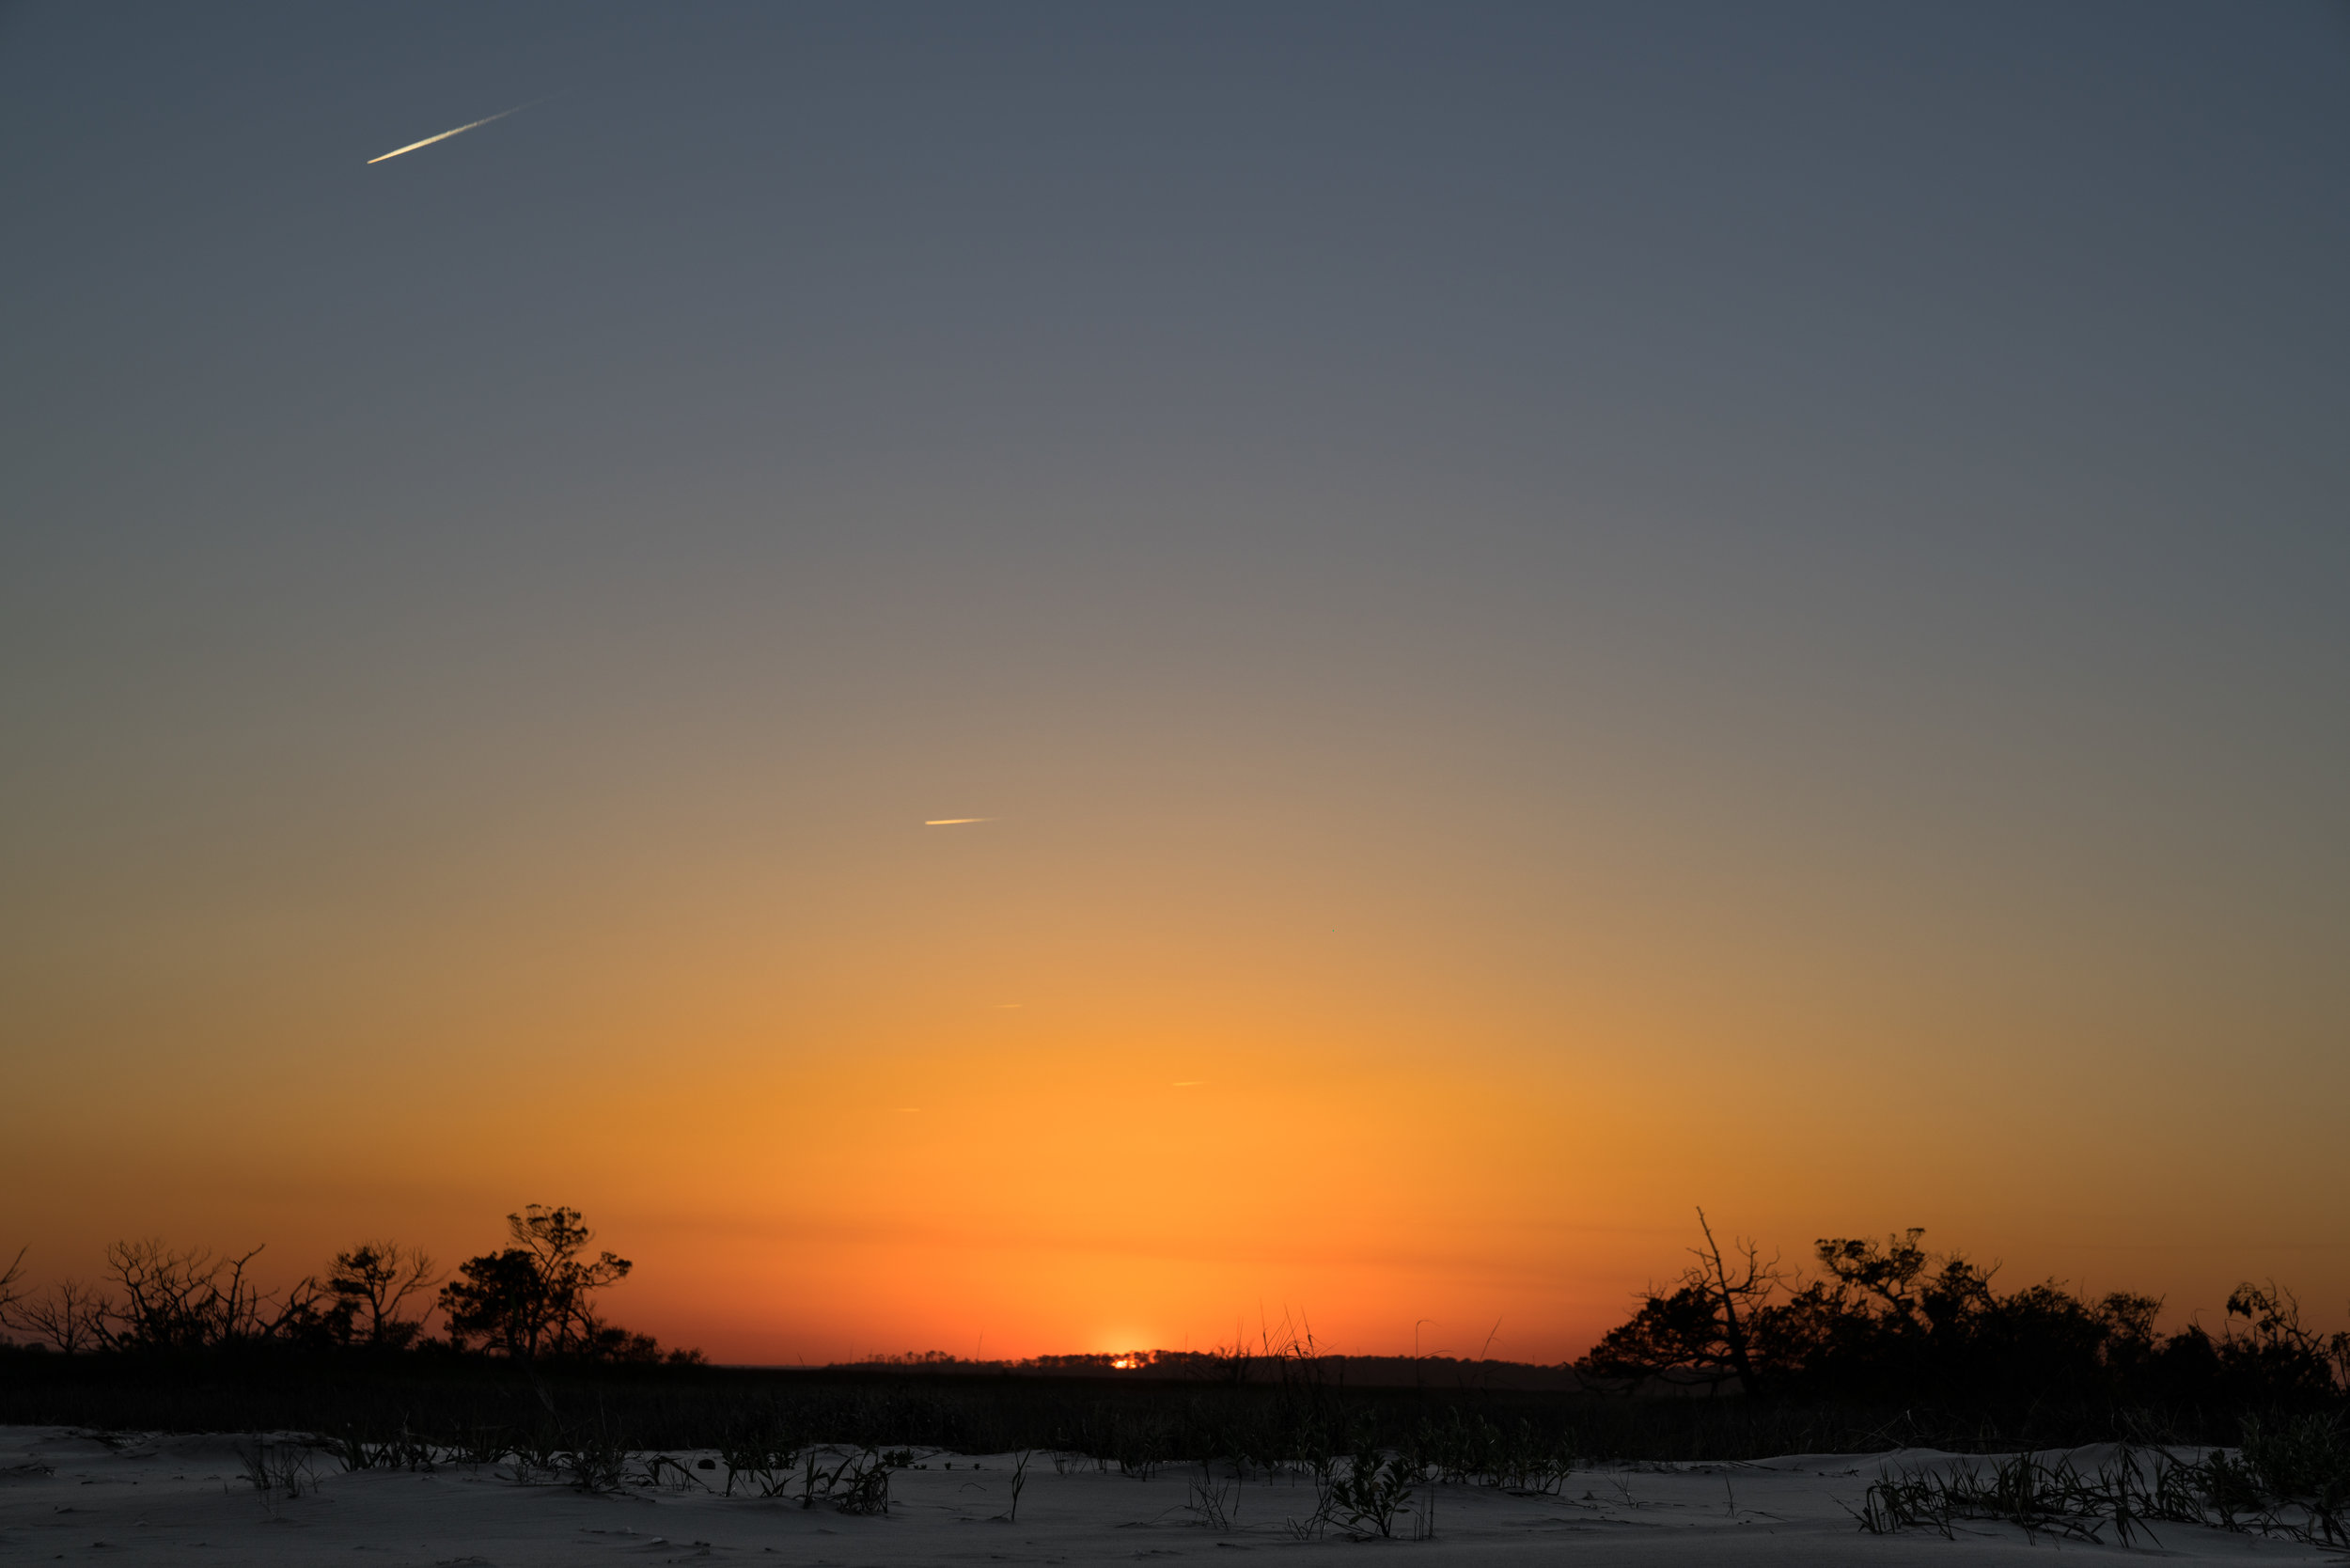 Sunset over Little Tybee Island